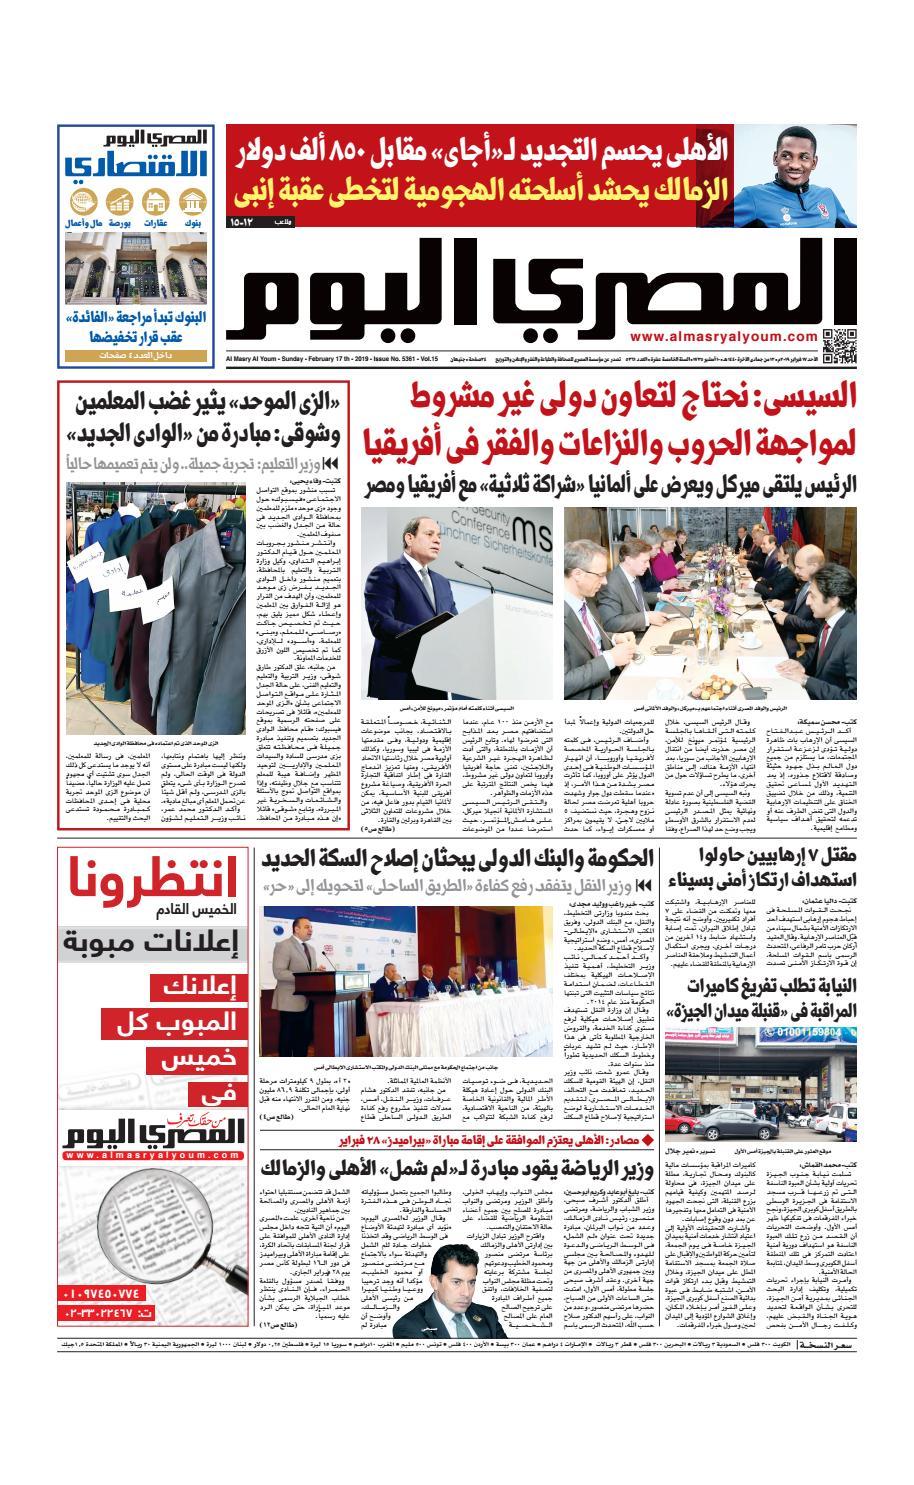 عدد الاحد 17 02 2019 By Al Masry Media Corp Issuu